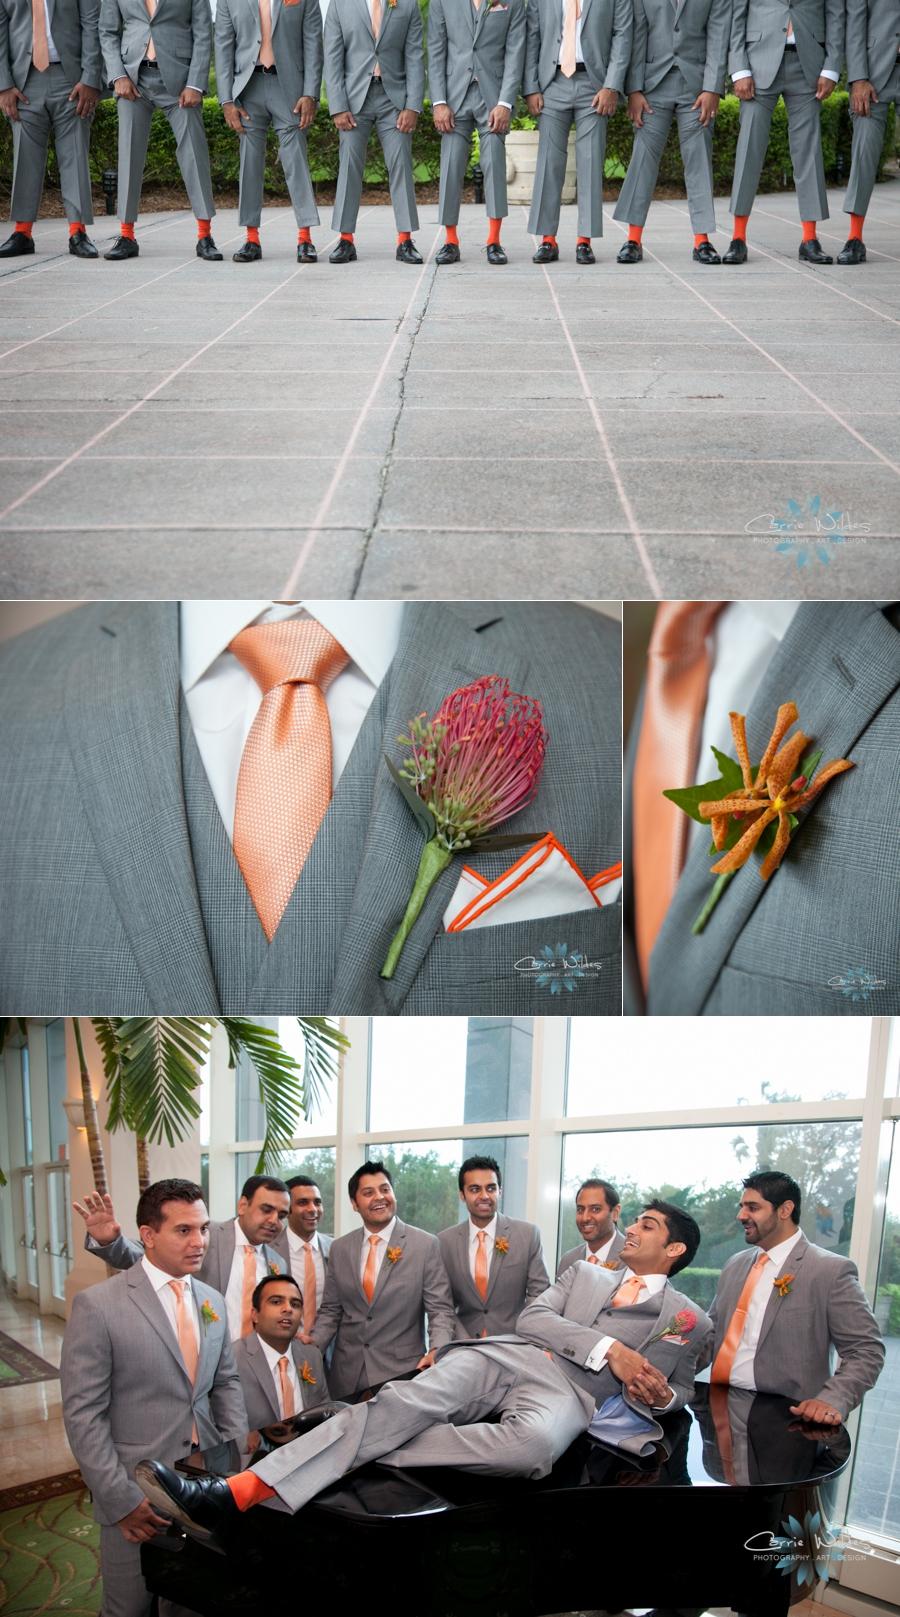 8_17_13 Grand Hyatt Tampa Bay Wedding_0008.jpg